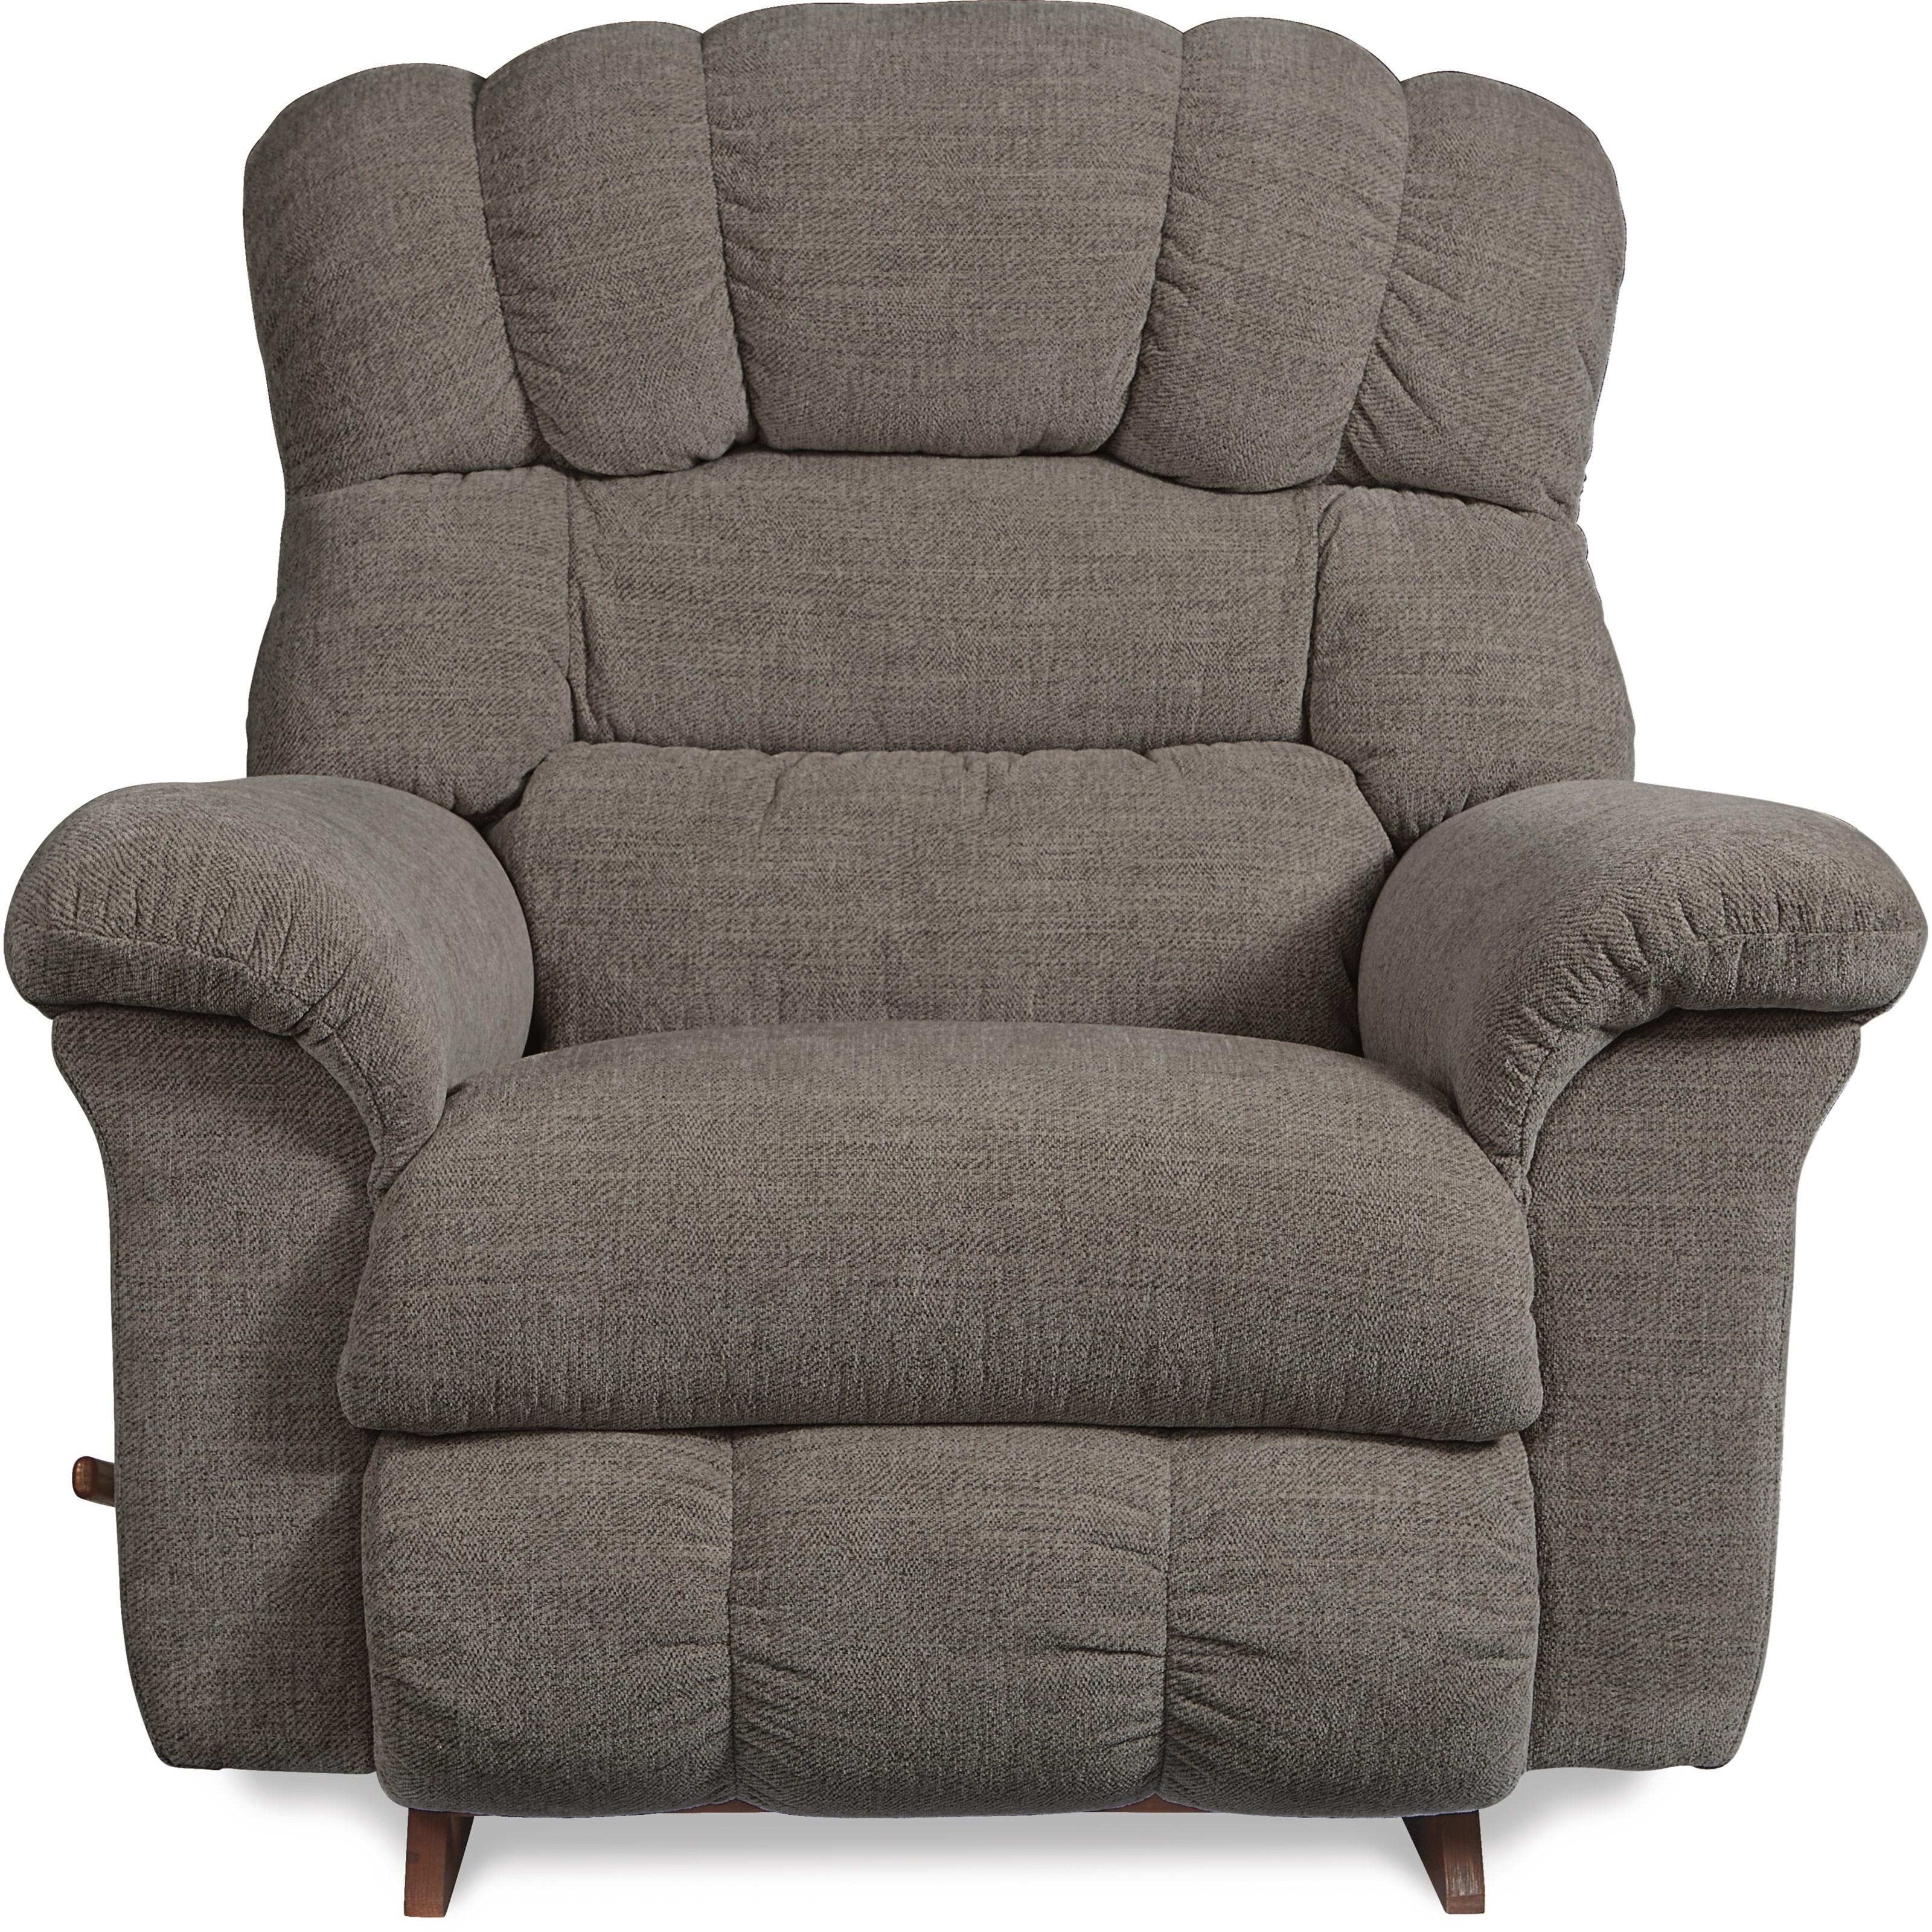 La Z Boy Crandell Reclina Rocker? Reclining Chair ...